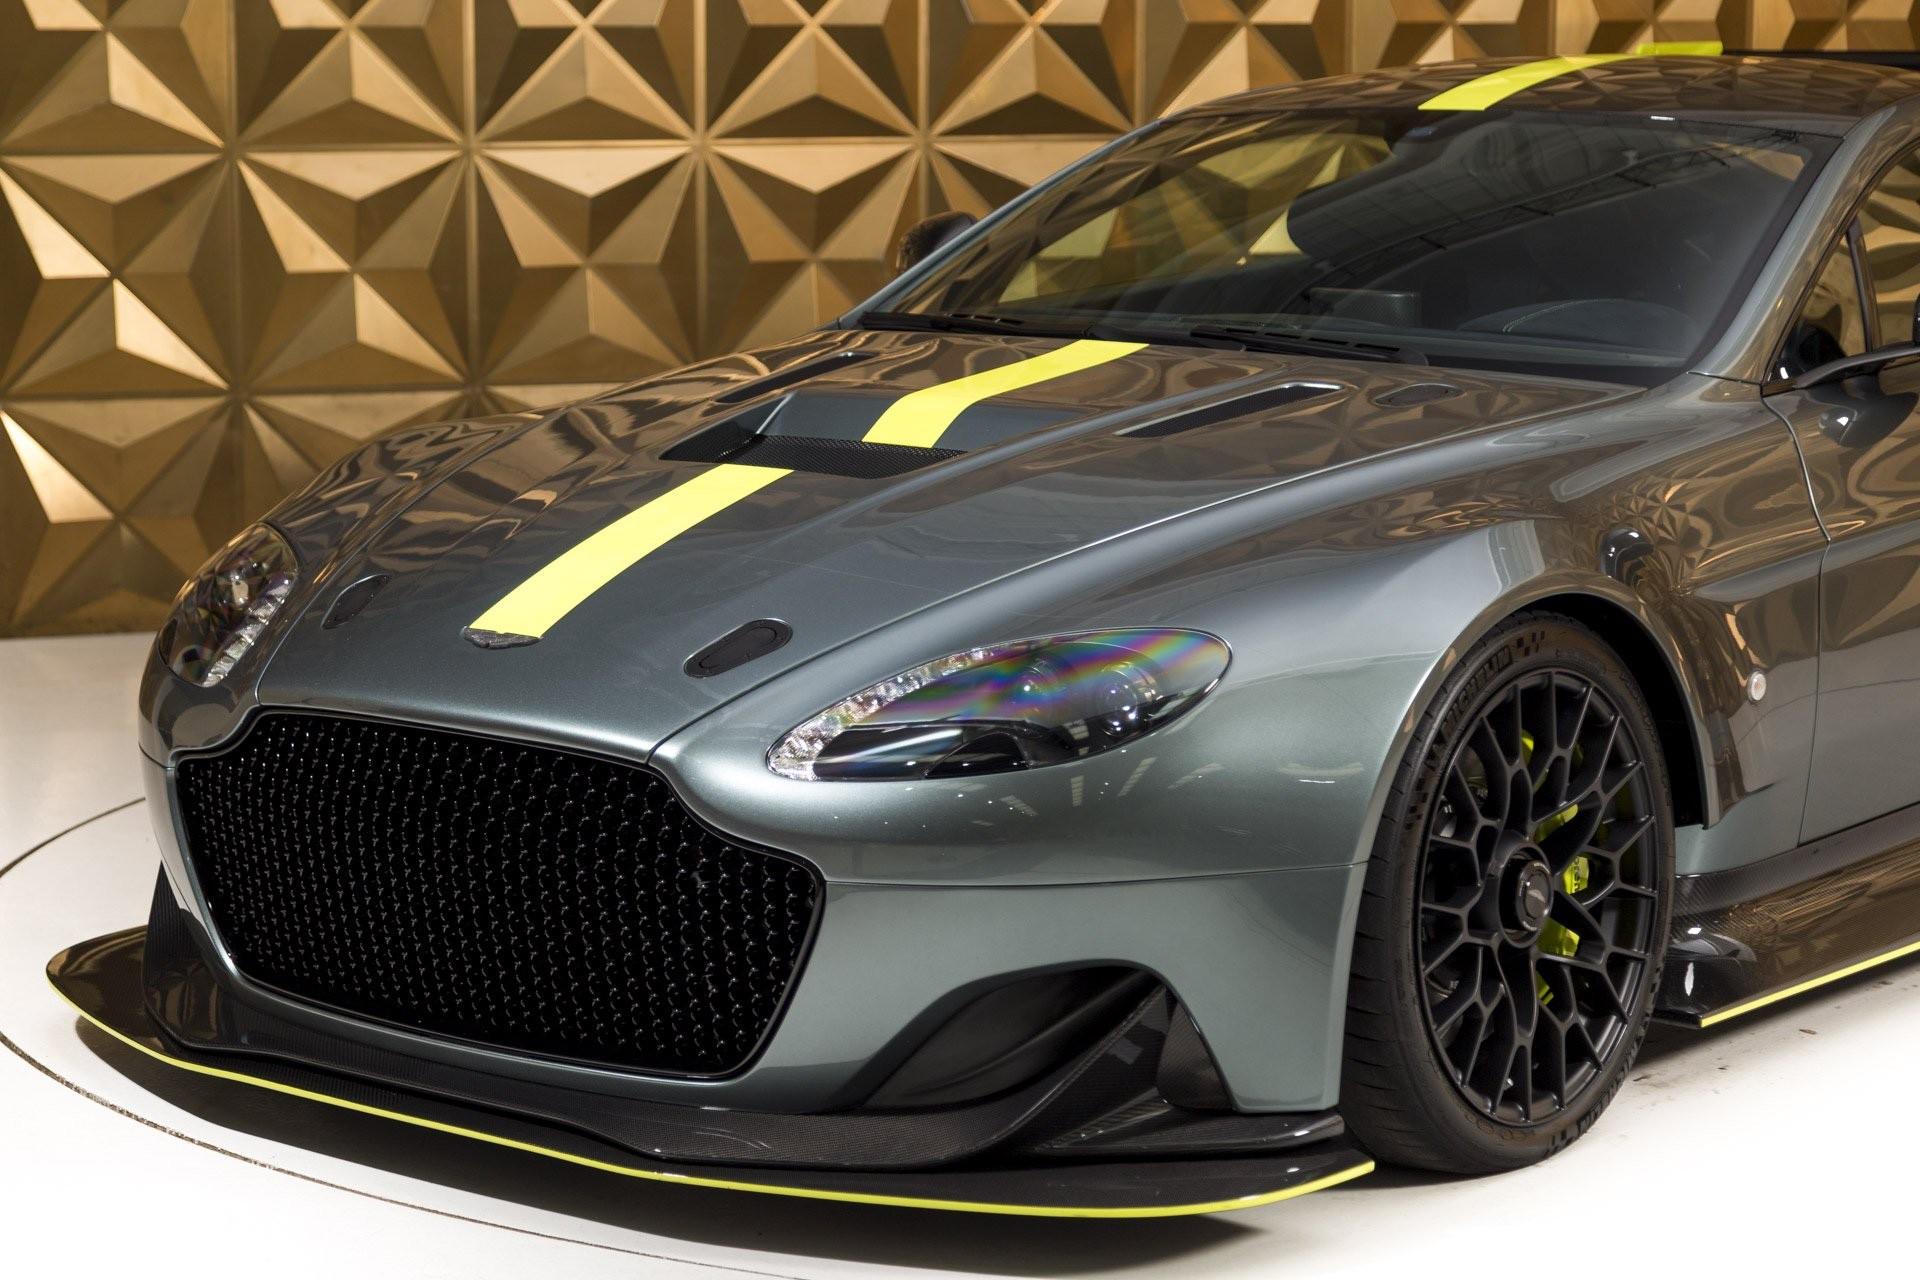 Aston_Martin_Vantage_AMR_Pro_sale-0009